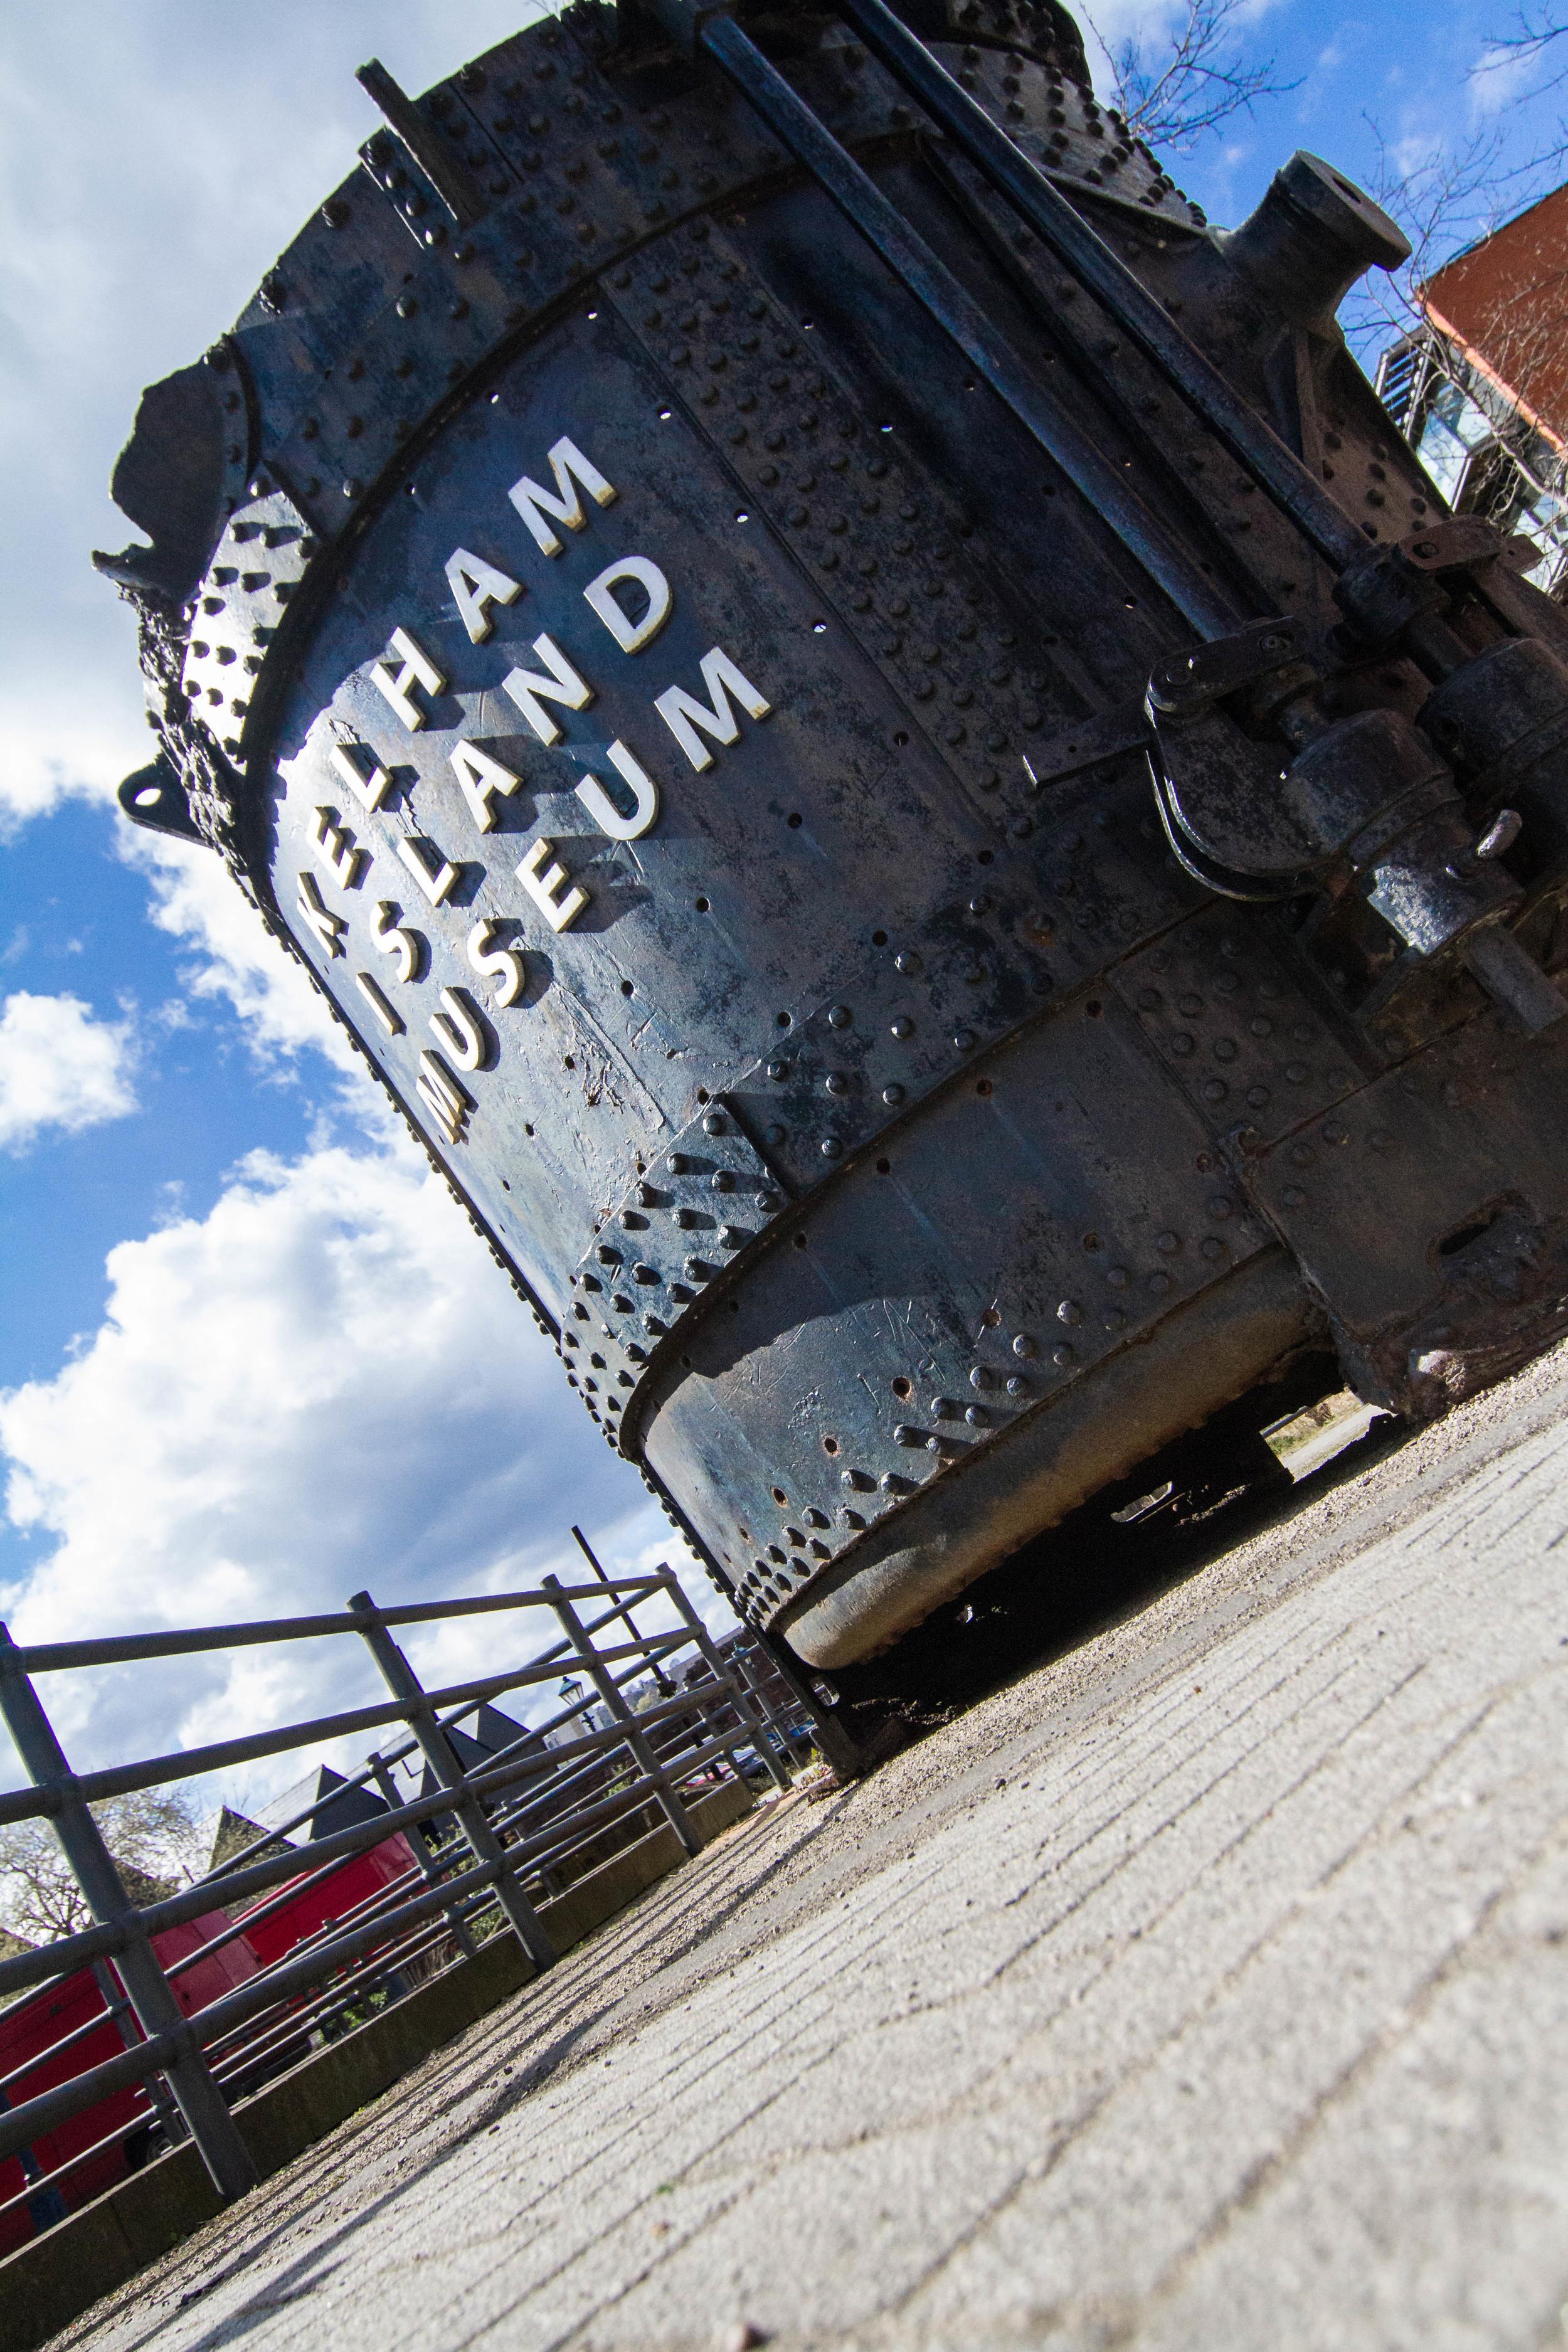 Steel city reinvented